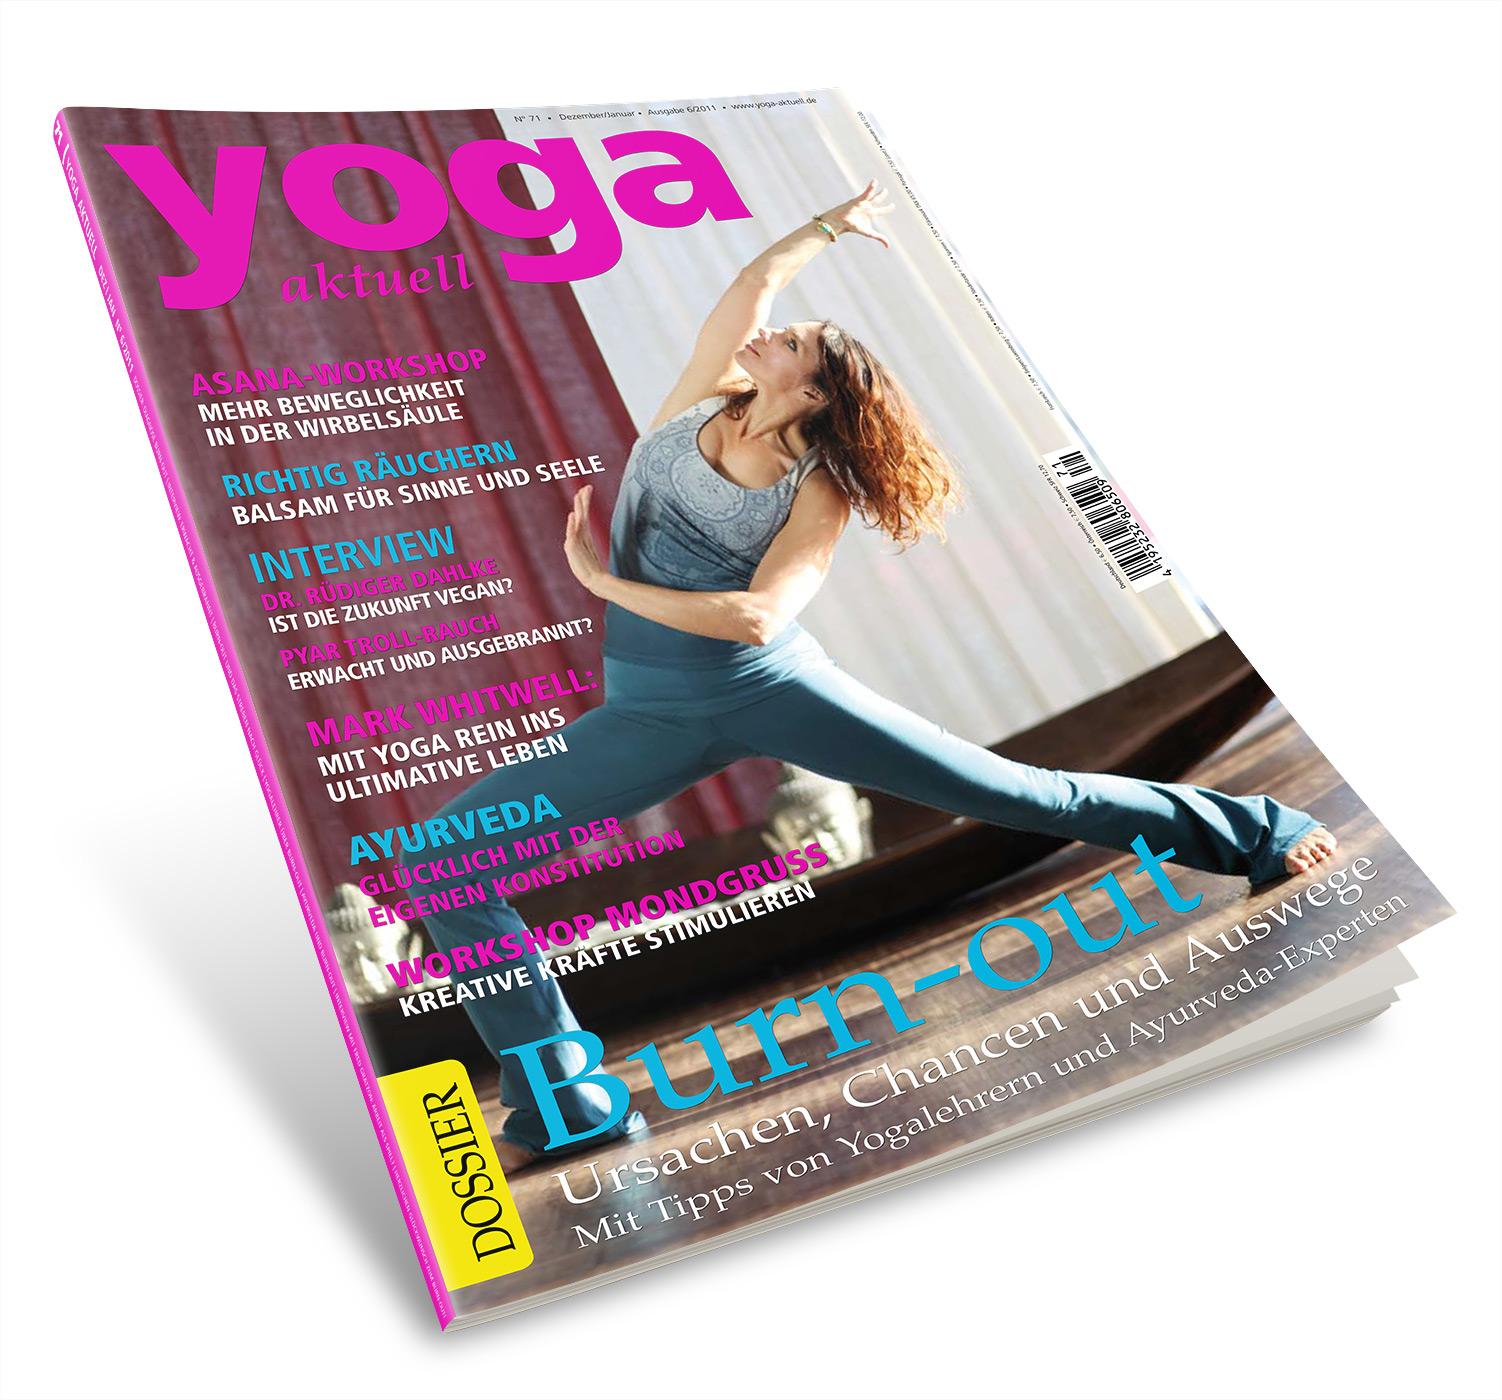 Yoga Aktuell 71 - 06/2011